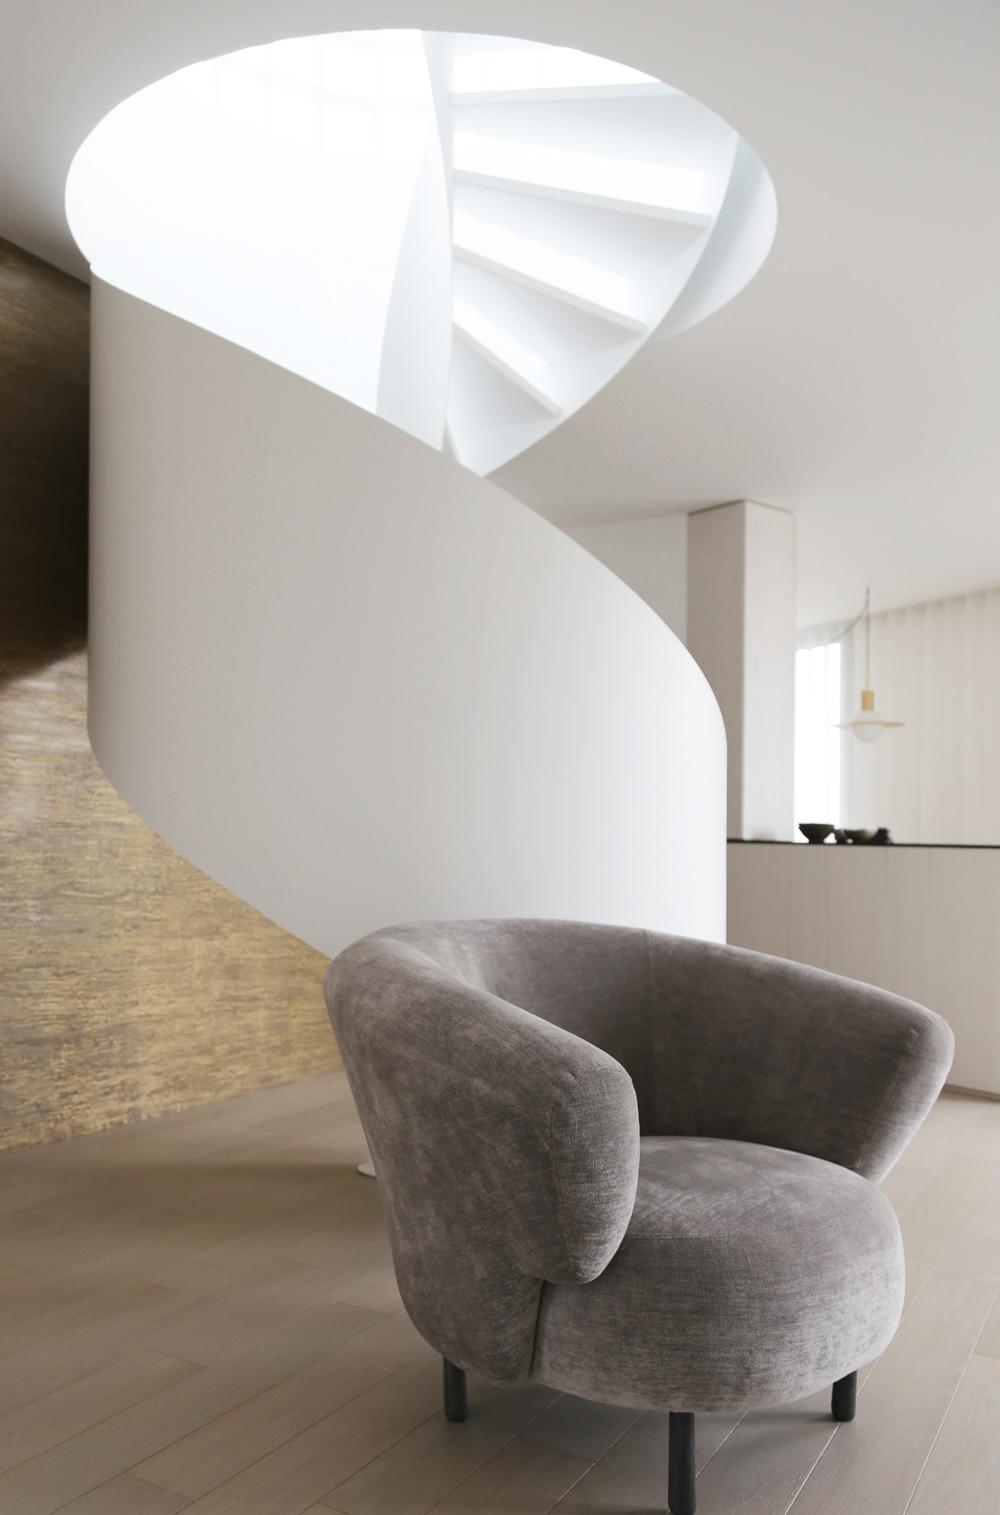 christophe-delcourt-interior-inspiration-9.jpg